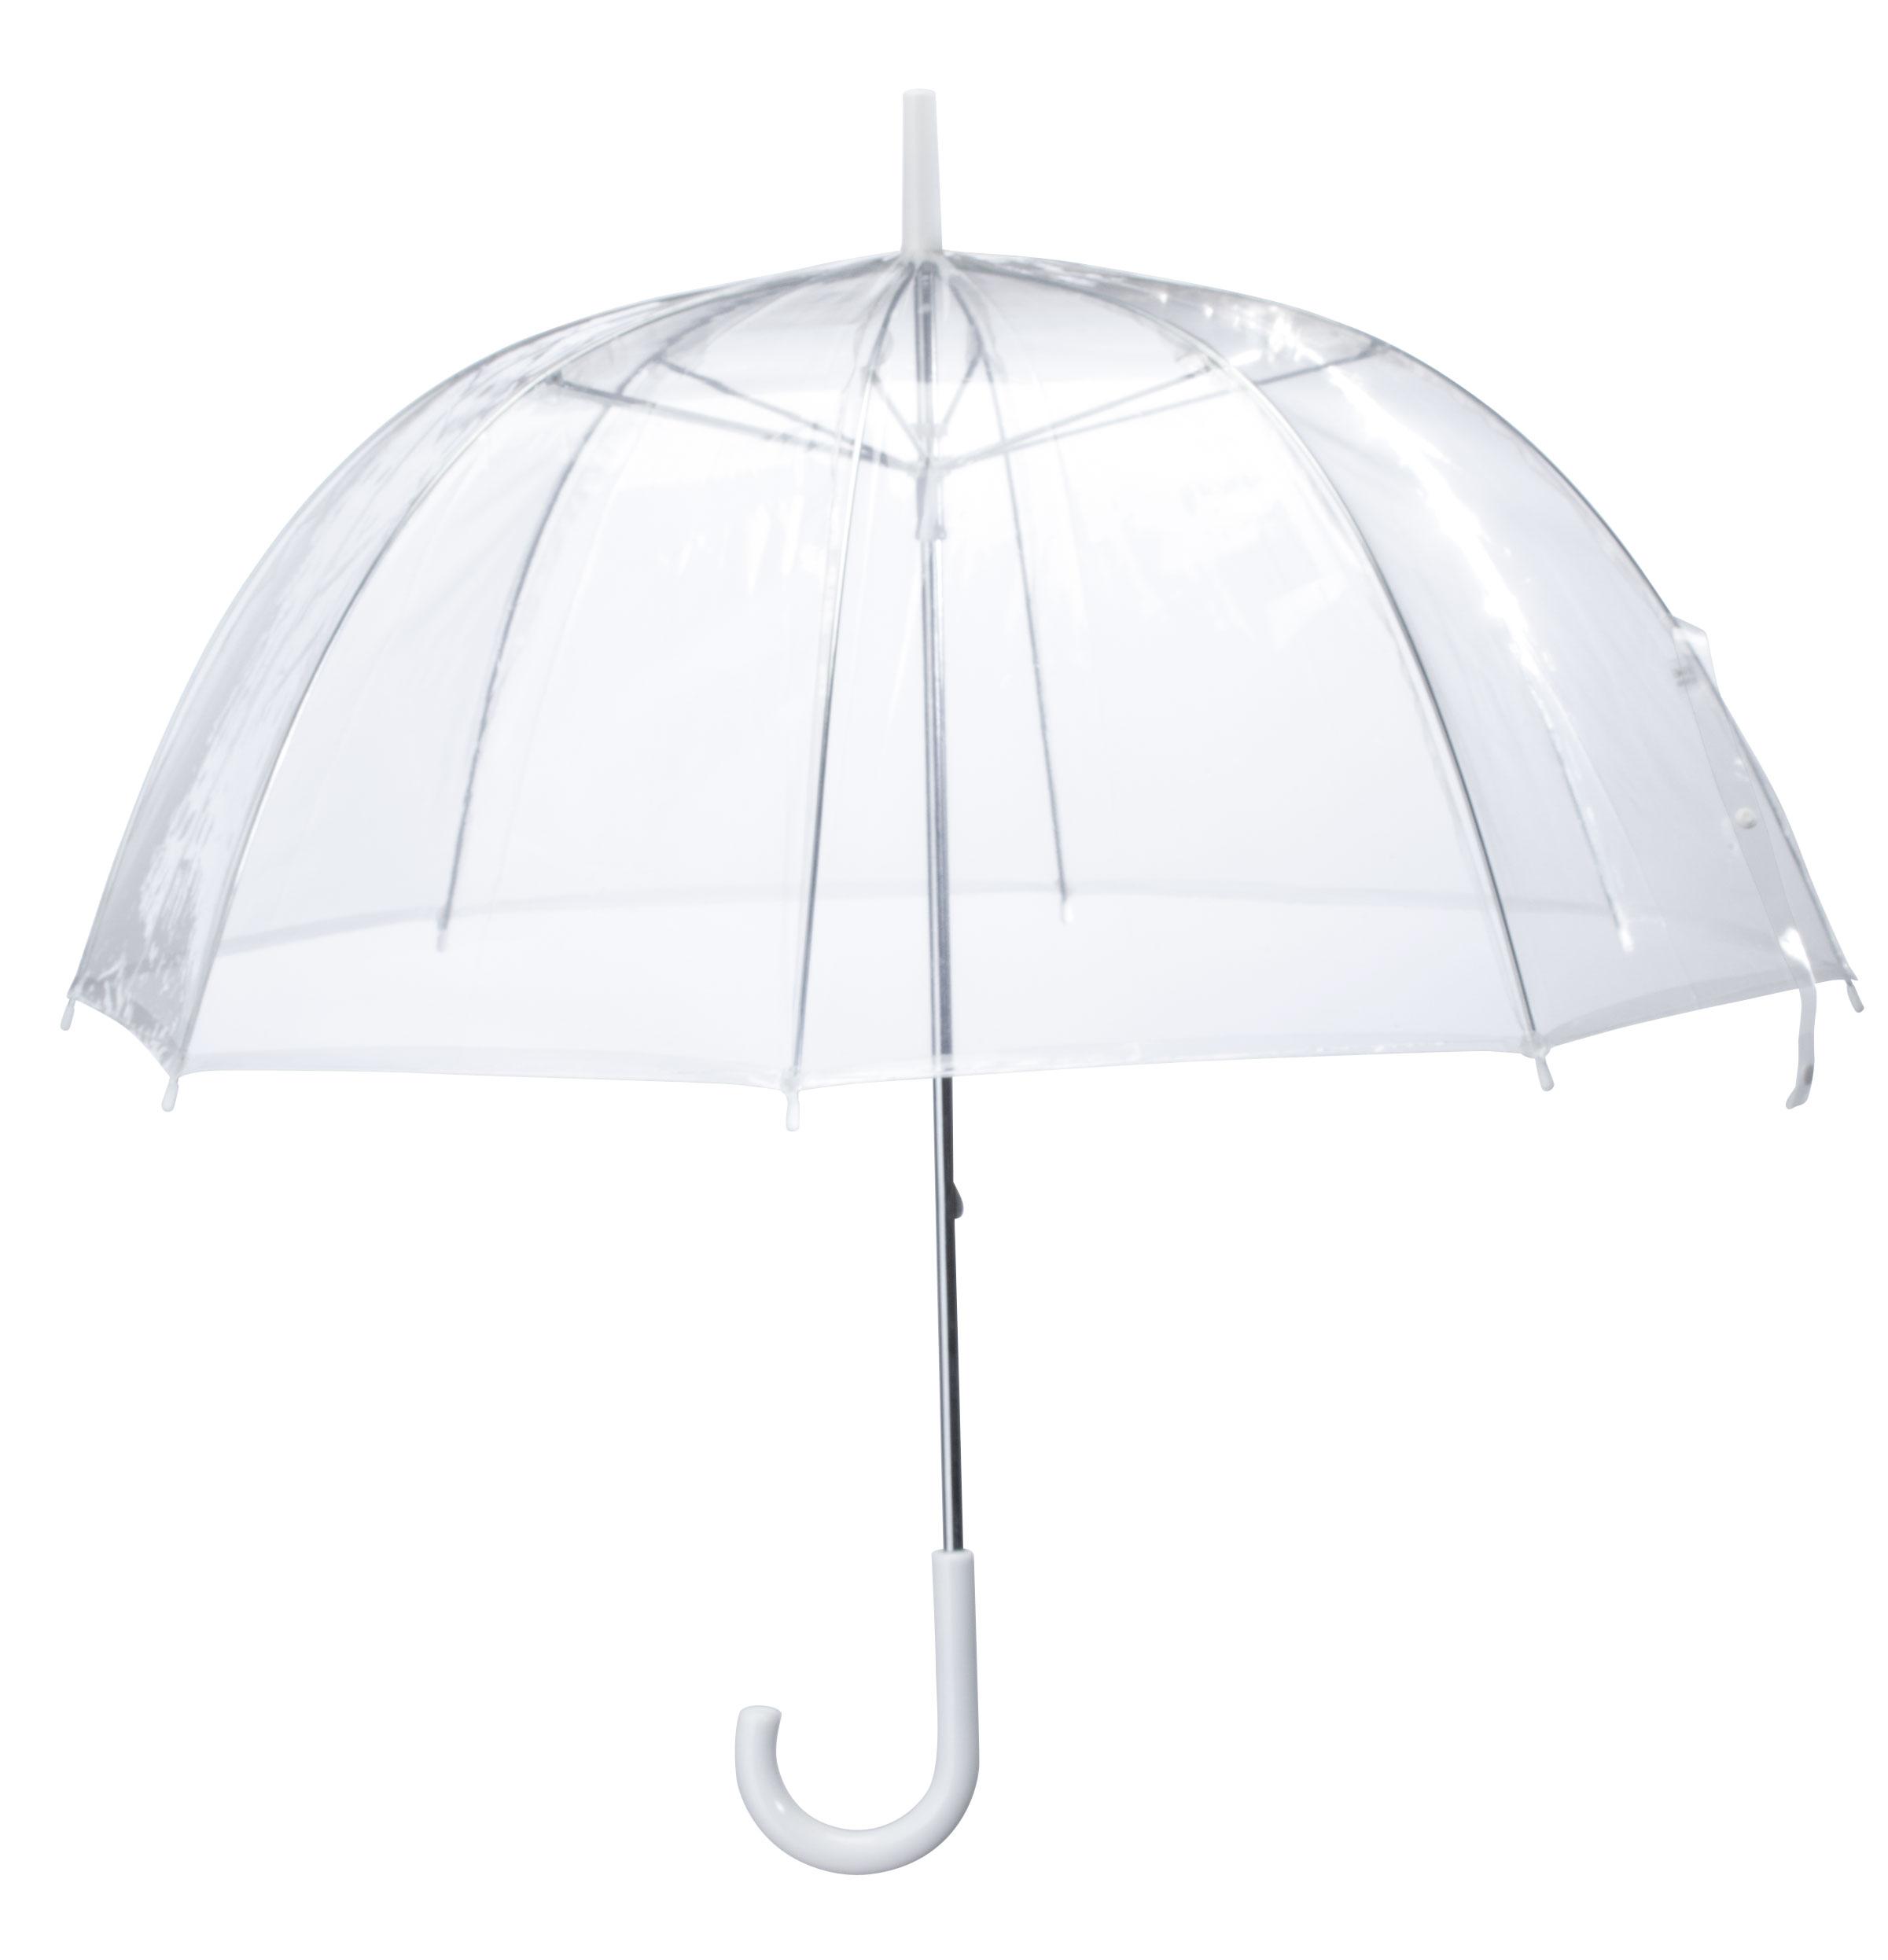 Miles Kimball Clear Dome Umbrella